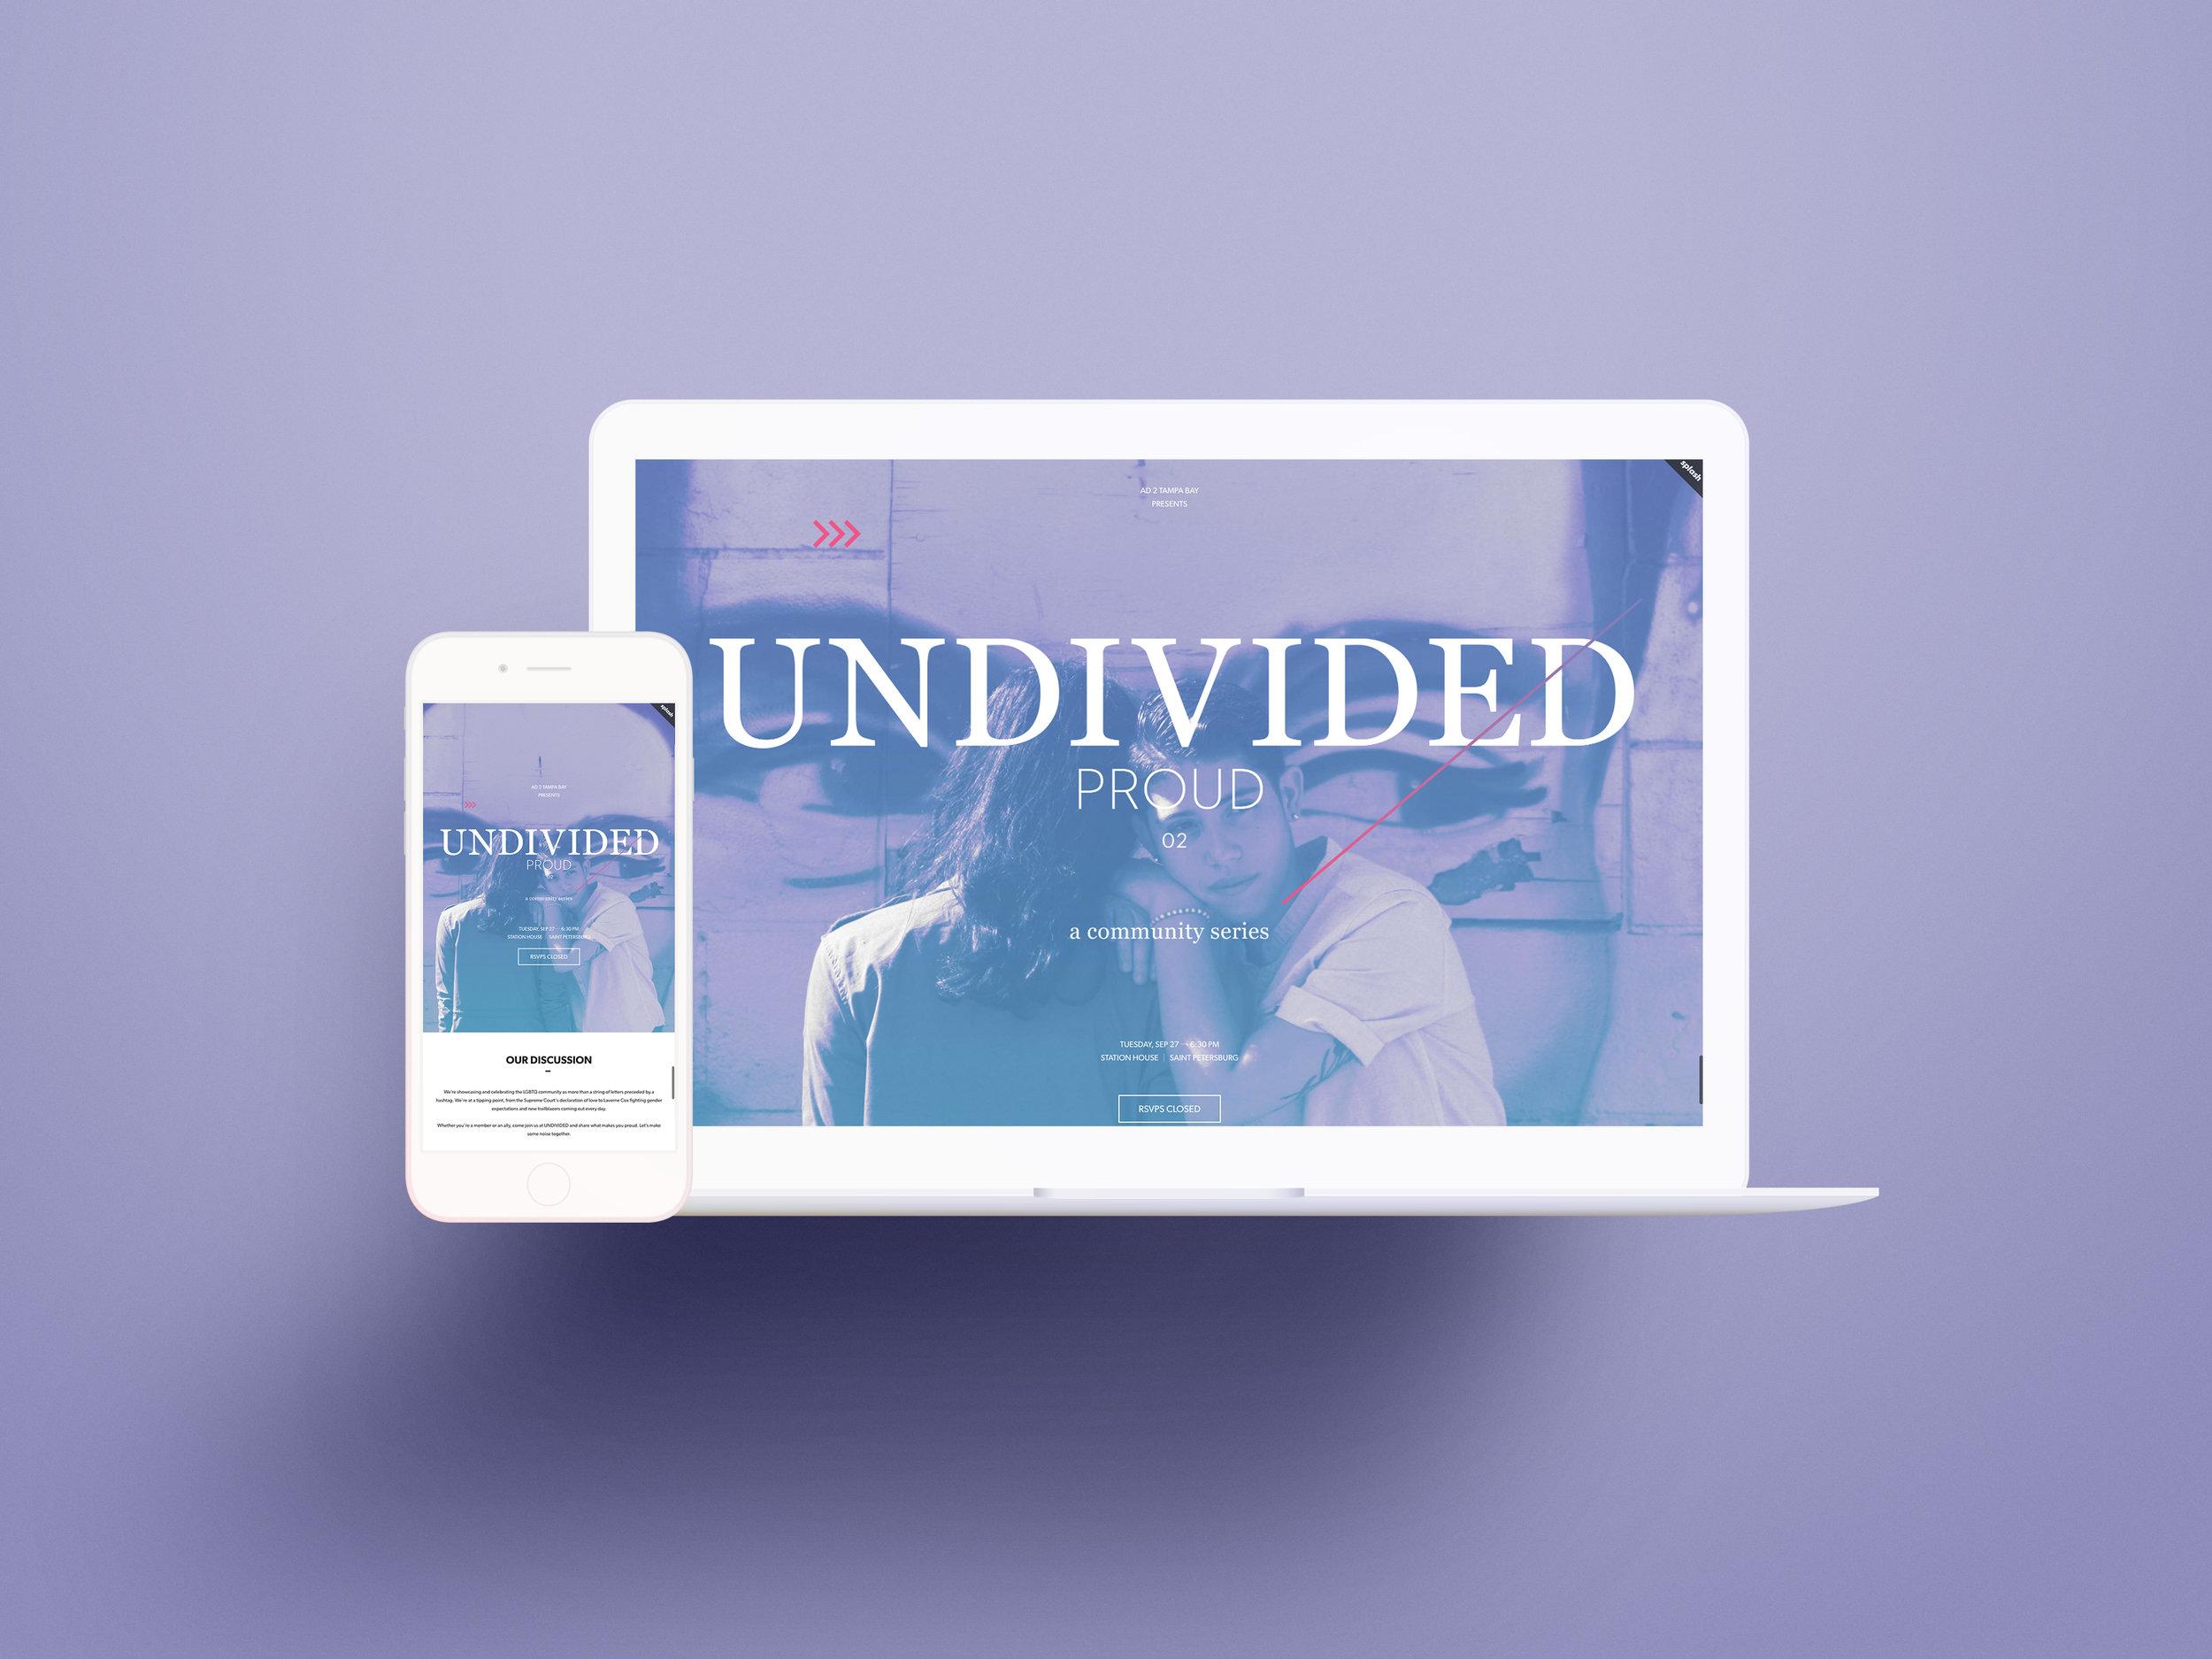 undivided_3.2.jpg